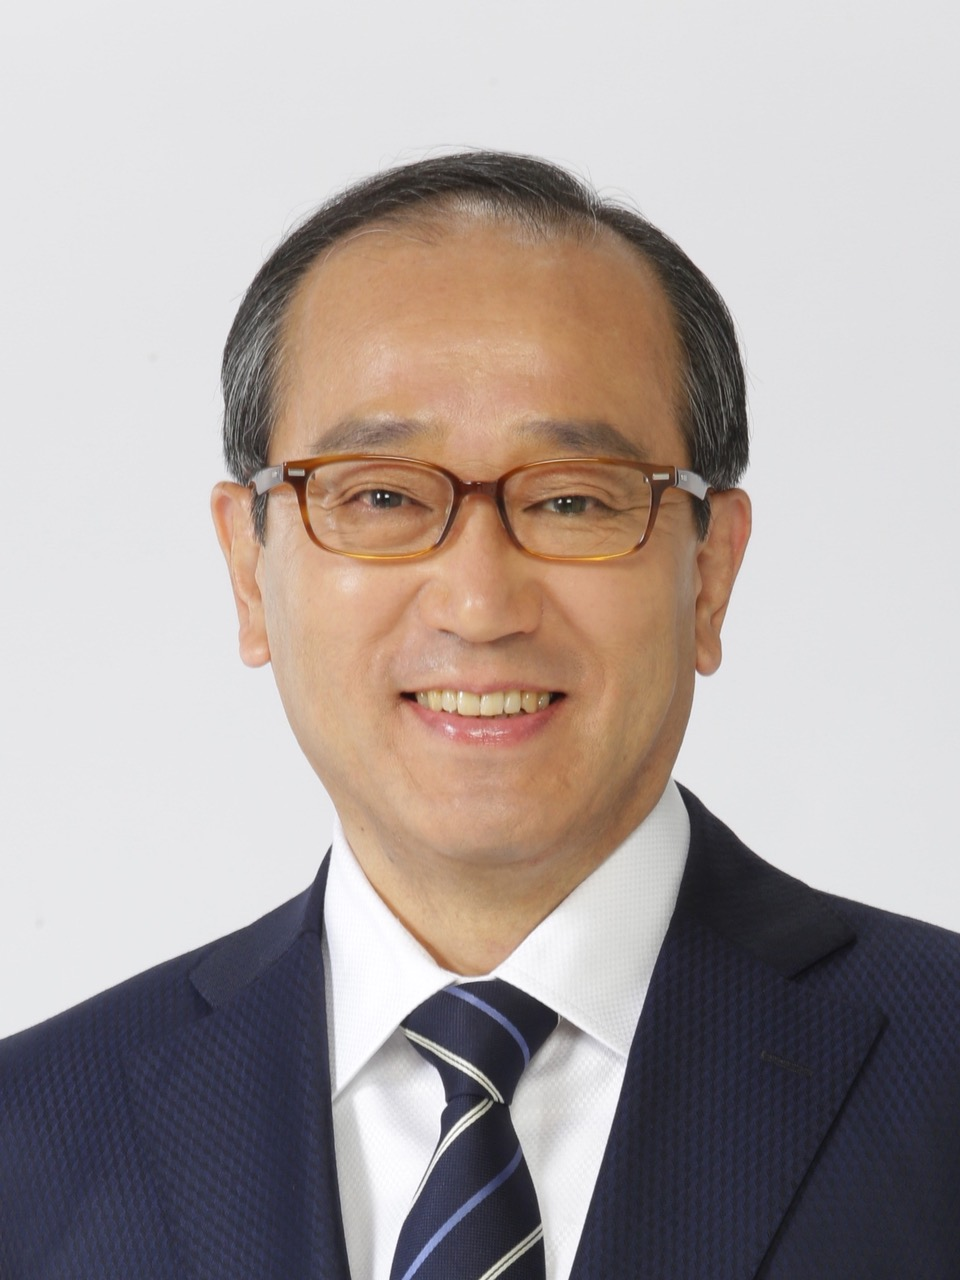 Headshot_Kazumi Matsui (Mayor of Hiroshima).jpeg